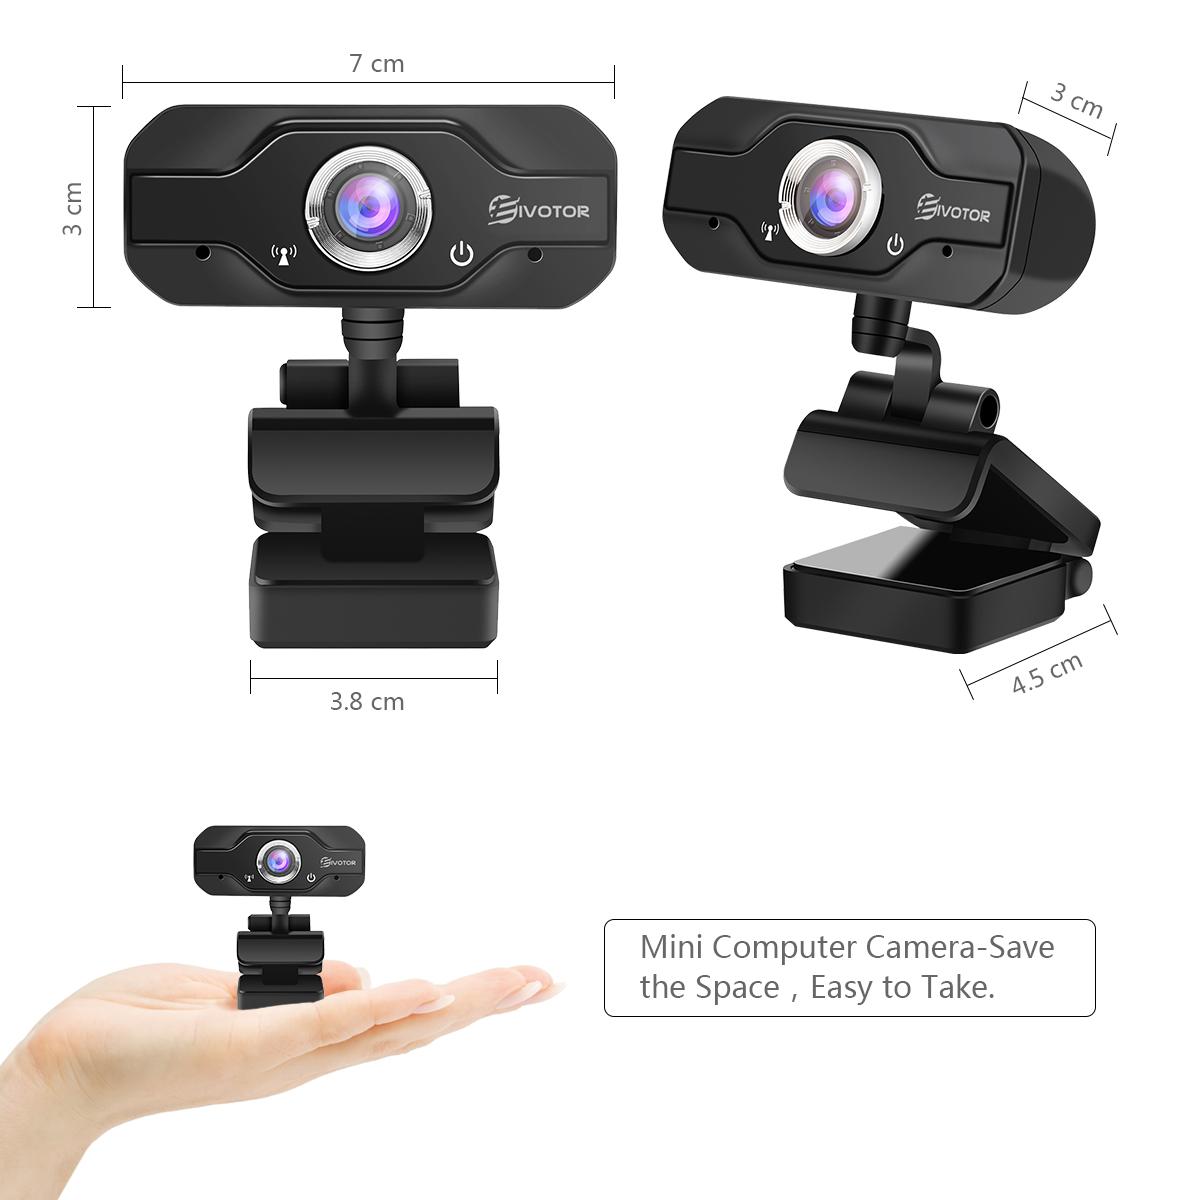 HD Laptop Webcam EIVOTOR USB Mini Webcam Camera with Built-in Microphone for Desktop Laptop 360-Degree Swivel 720P Camera